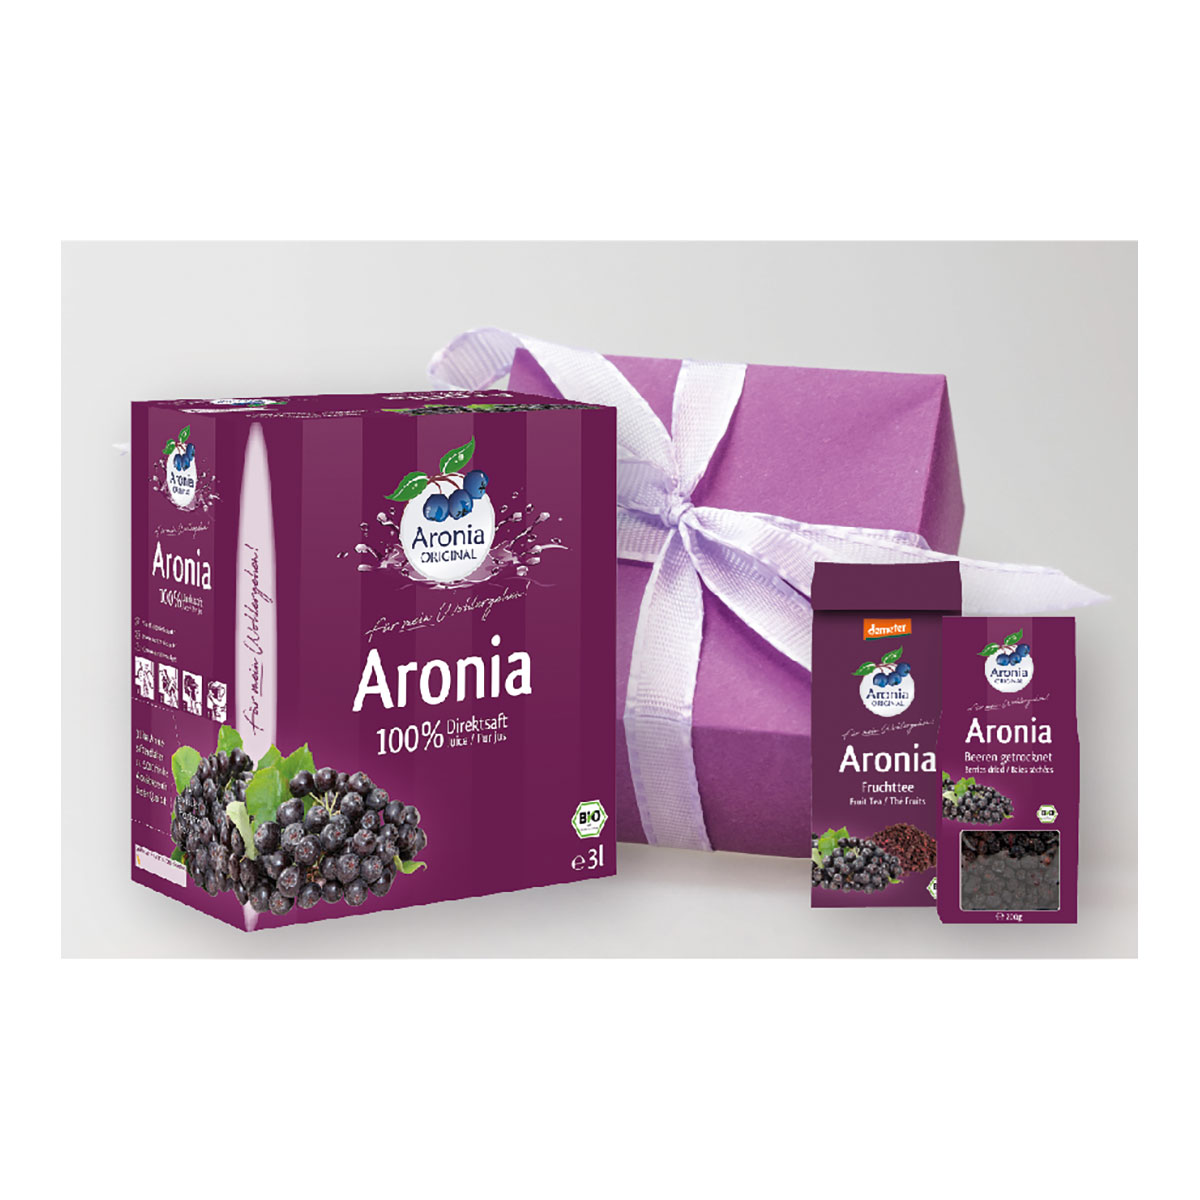 Aronia - Unsere Klassiker, Paket